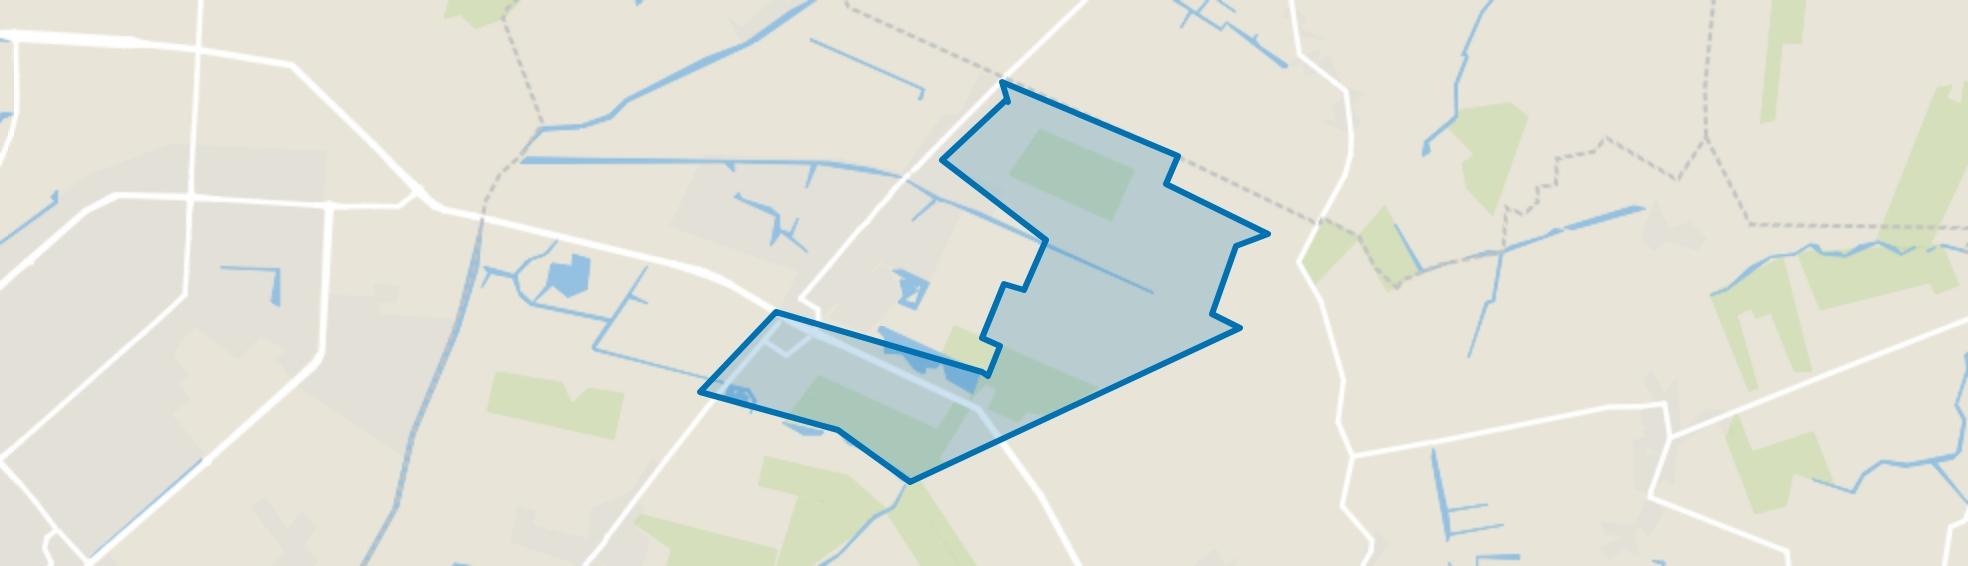 Obdam Verspreide huizen Oost, Obdam map